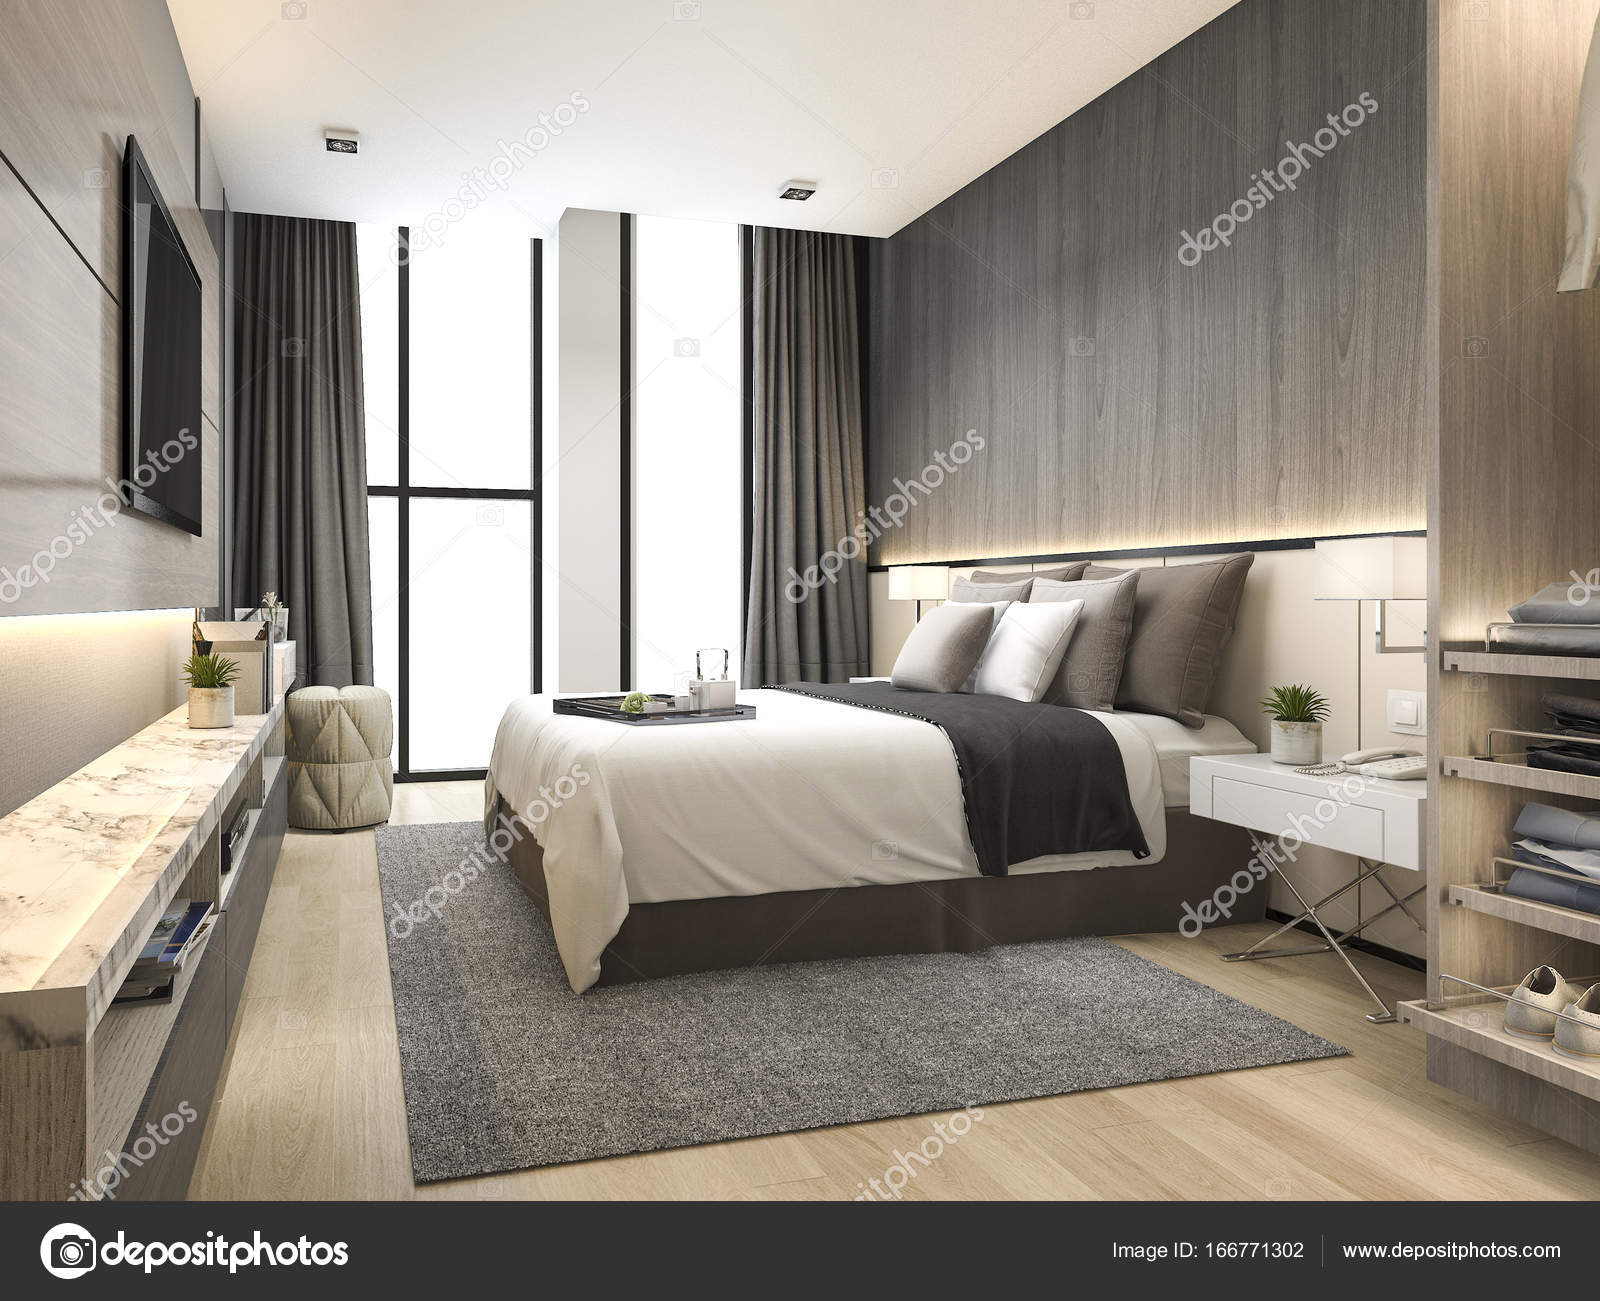 https://st3.depositphotos.com/11352286/16677/i/1600/depositphotos_166771302-stockafbeelding-3d-rendering-luxe-moderne-slaapkamer.jpg